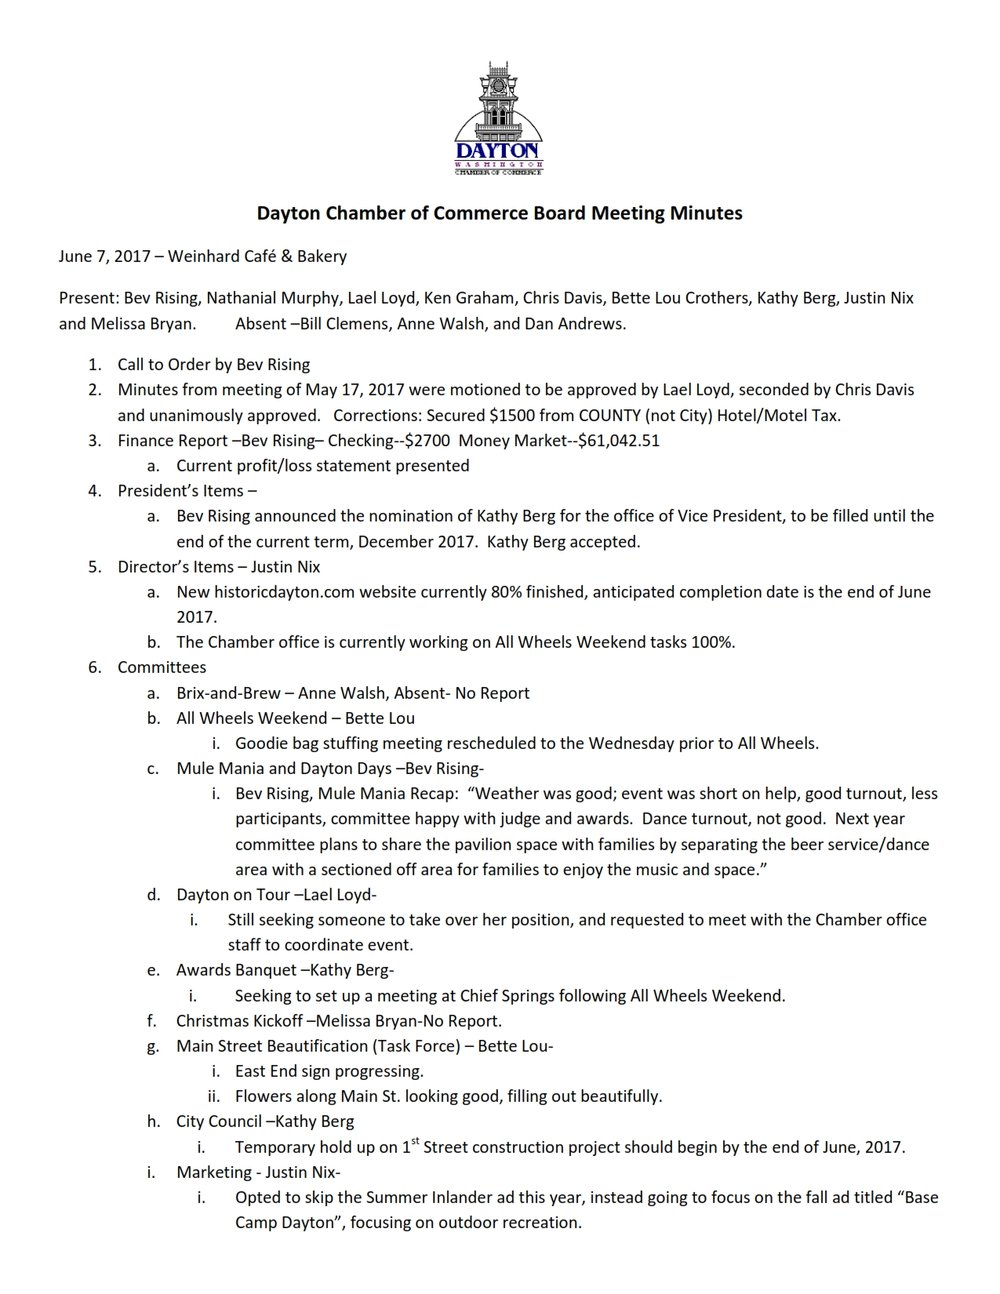 Minutes 6-7-2017final_001.jpg